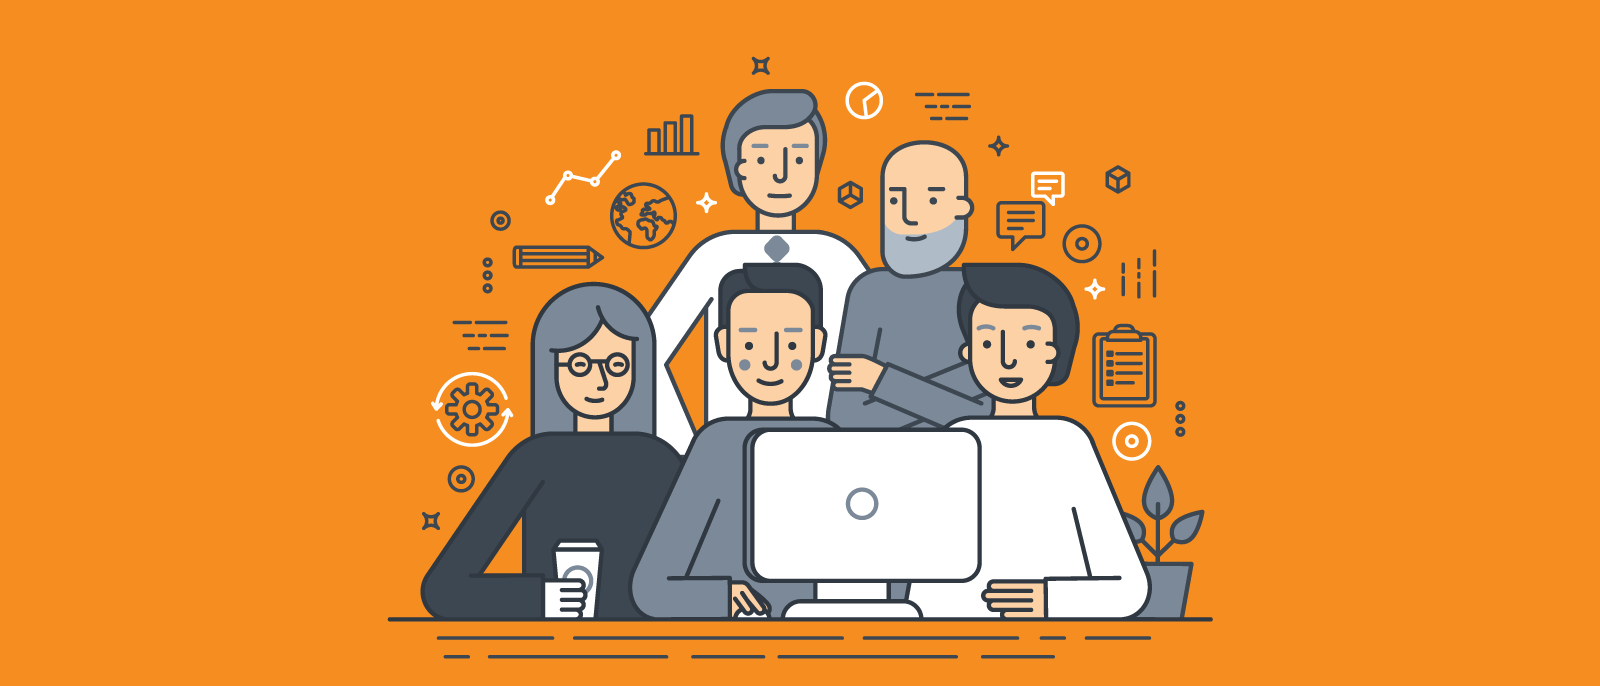 Communication hacks for project management processes